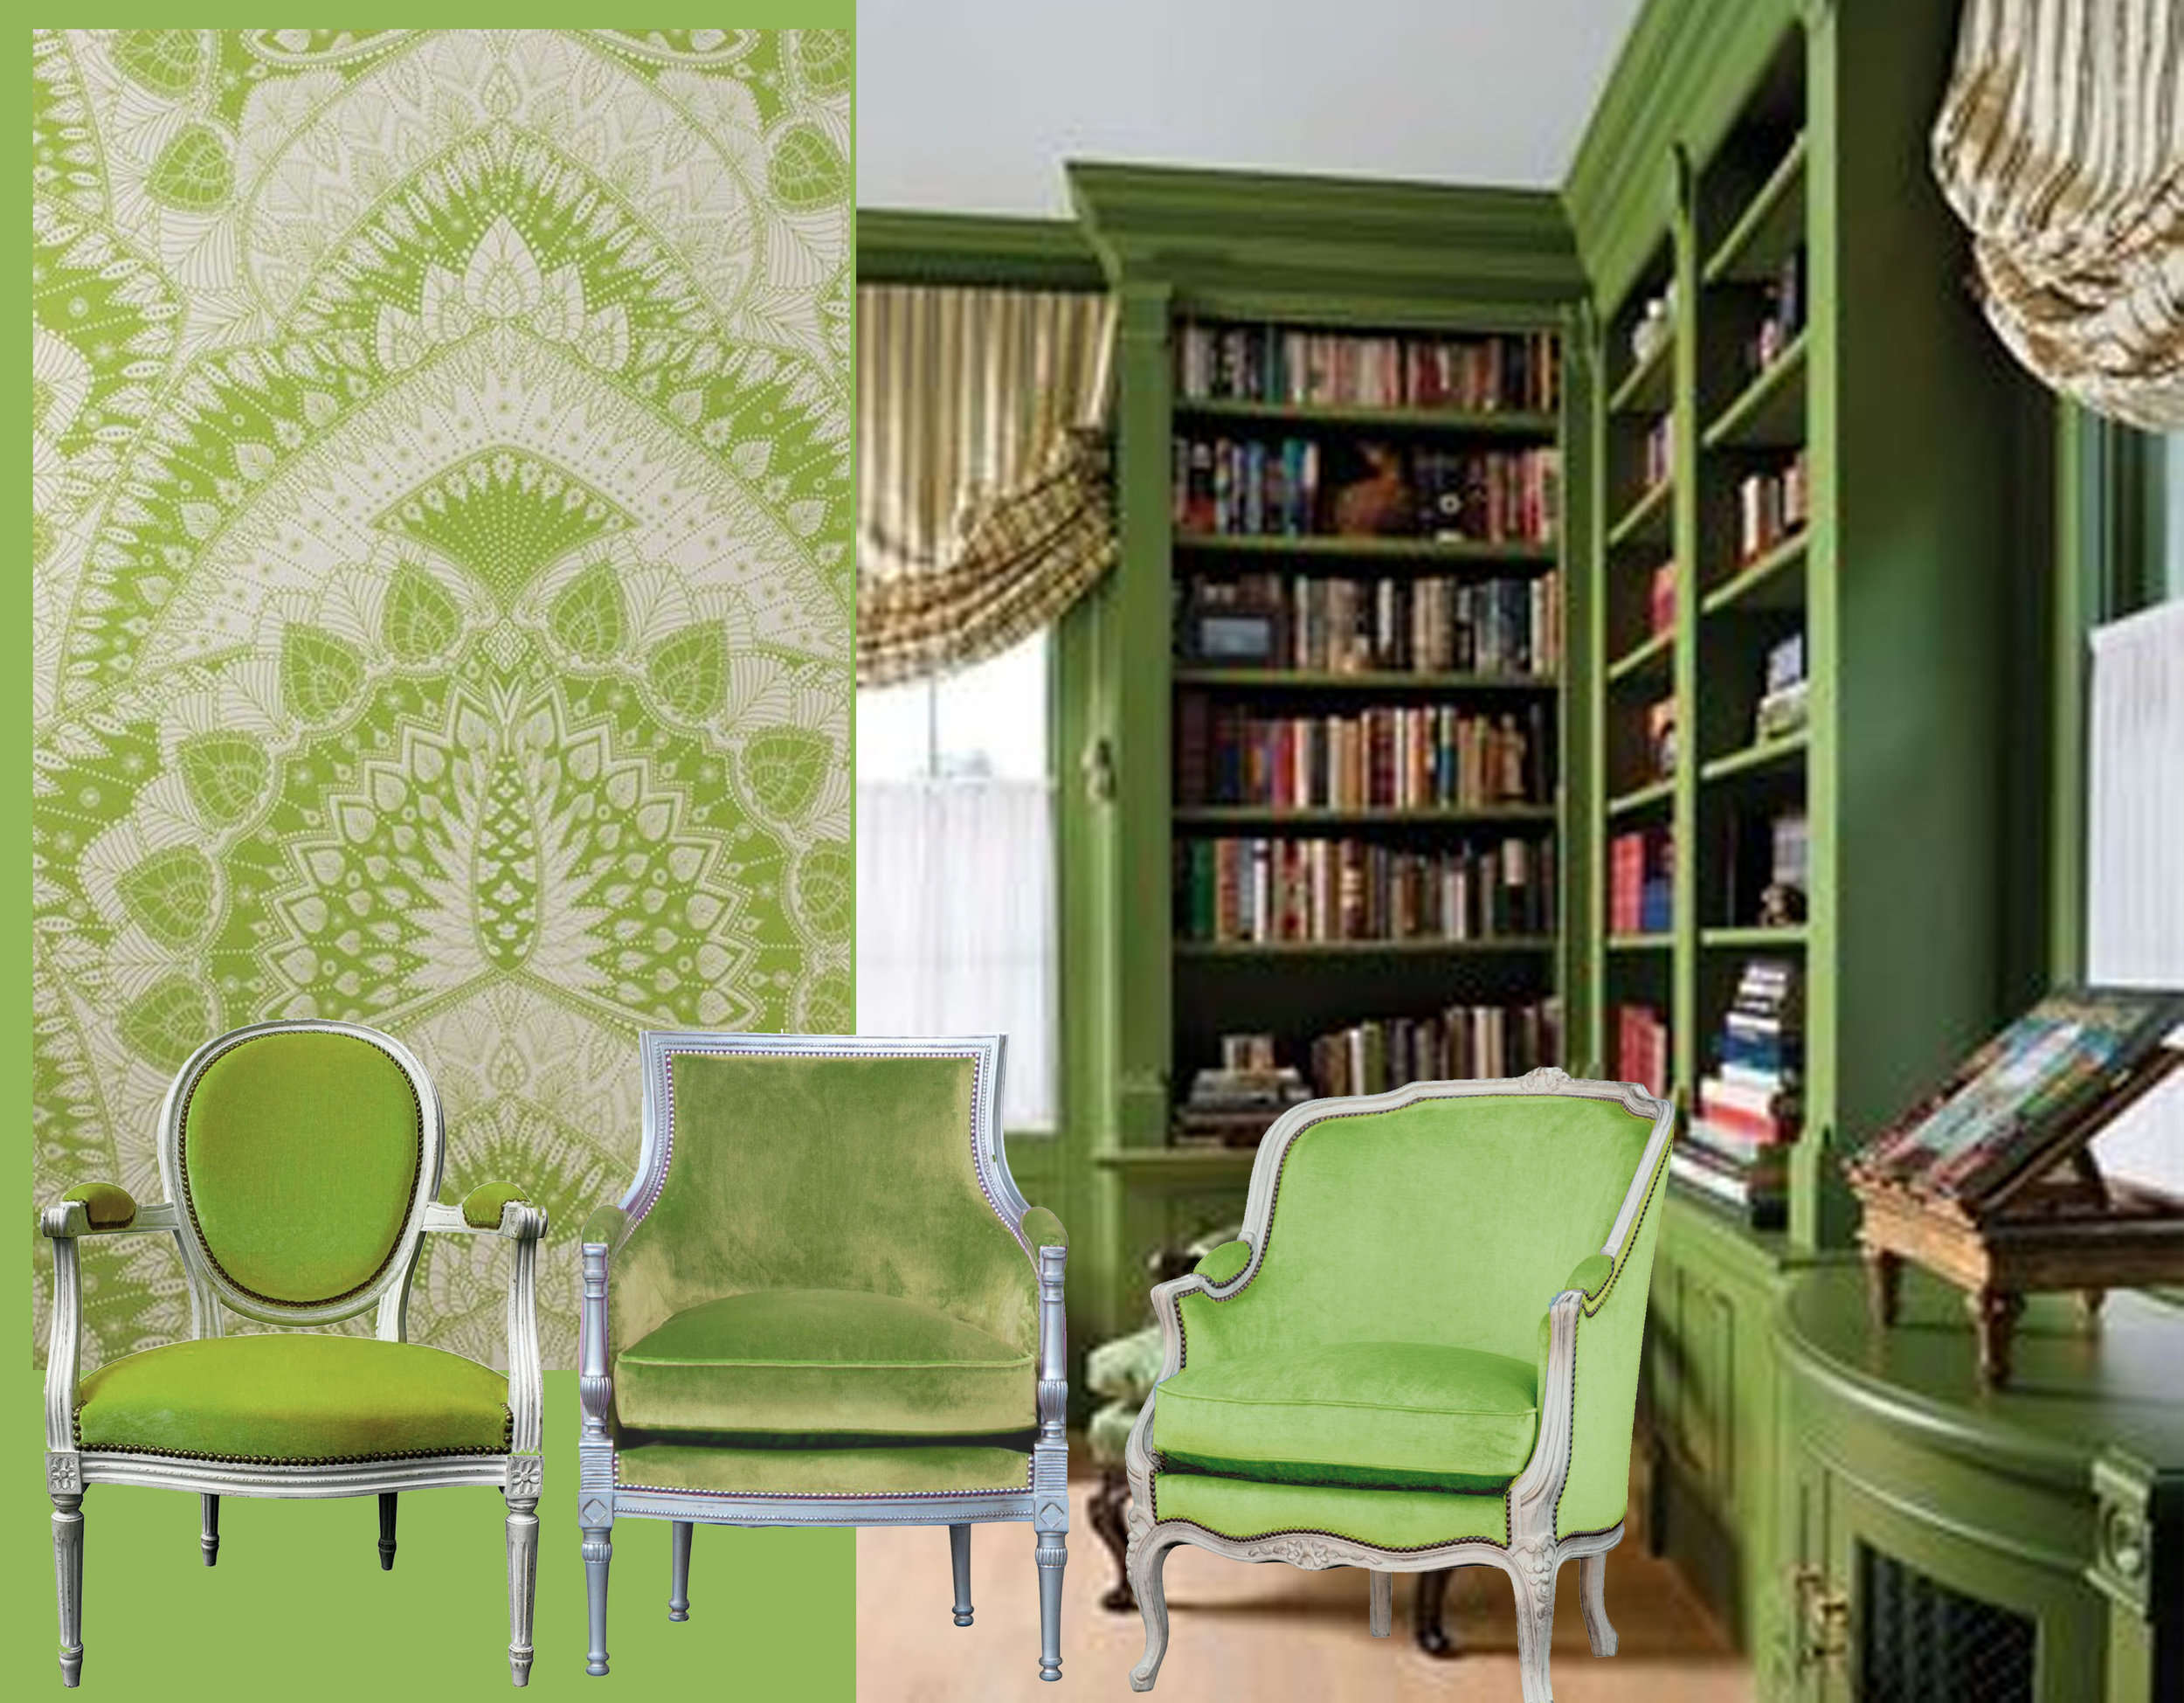 armchairs  Gilles Nouailhac  - wallpaper Azari  Osborne & Little  - classical interior via  Pinterest